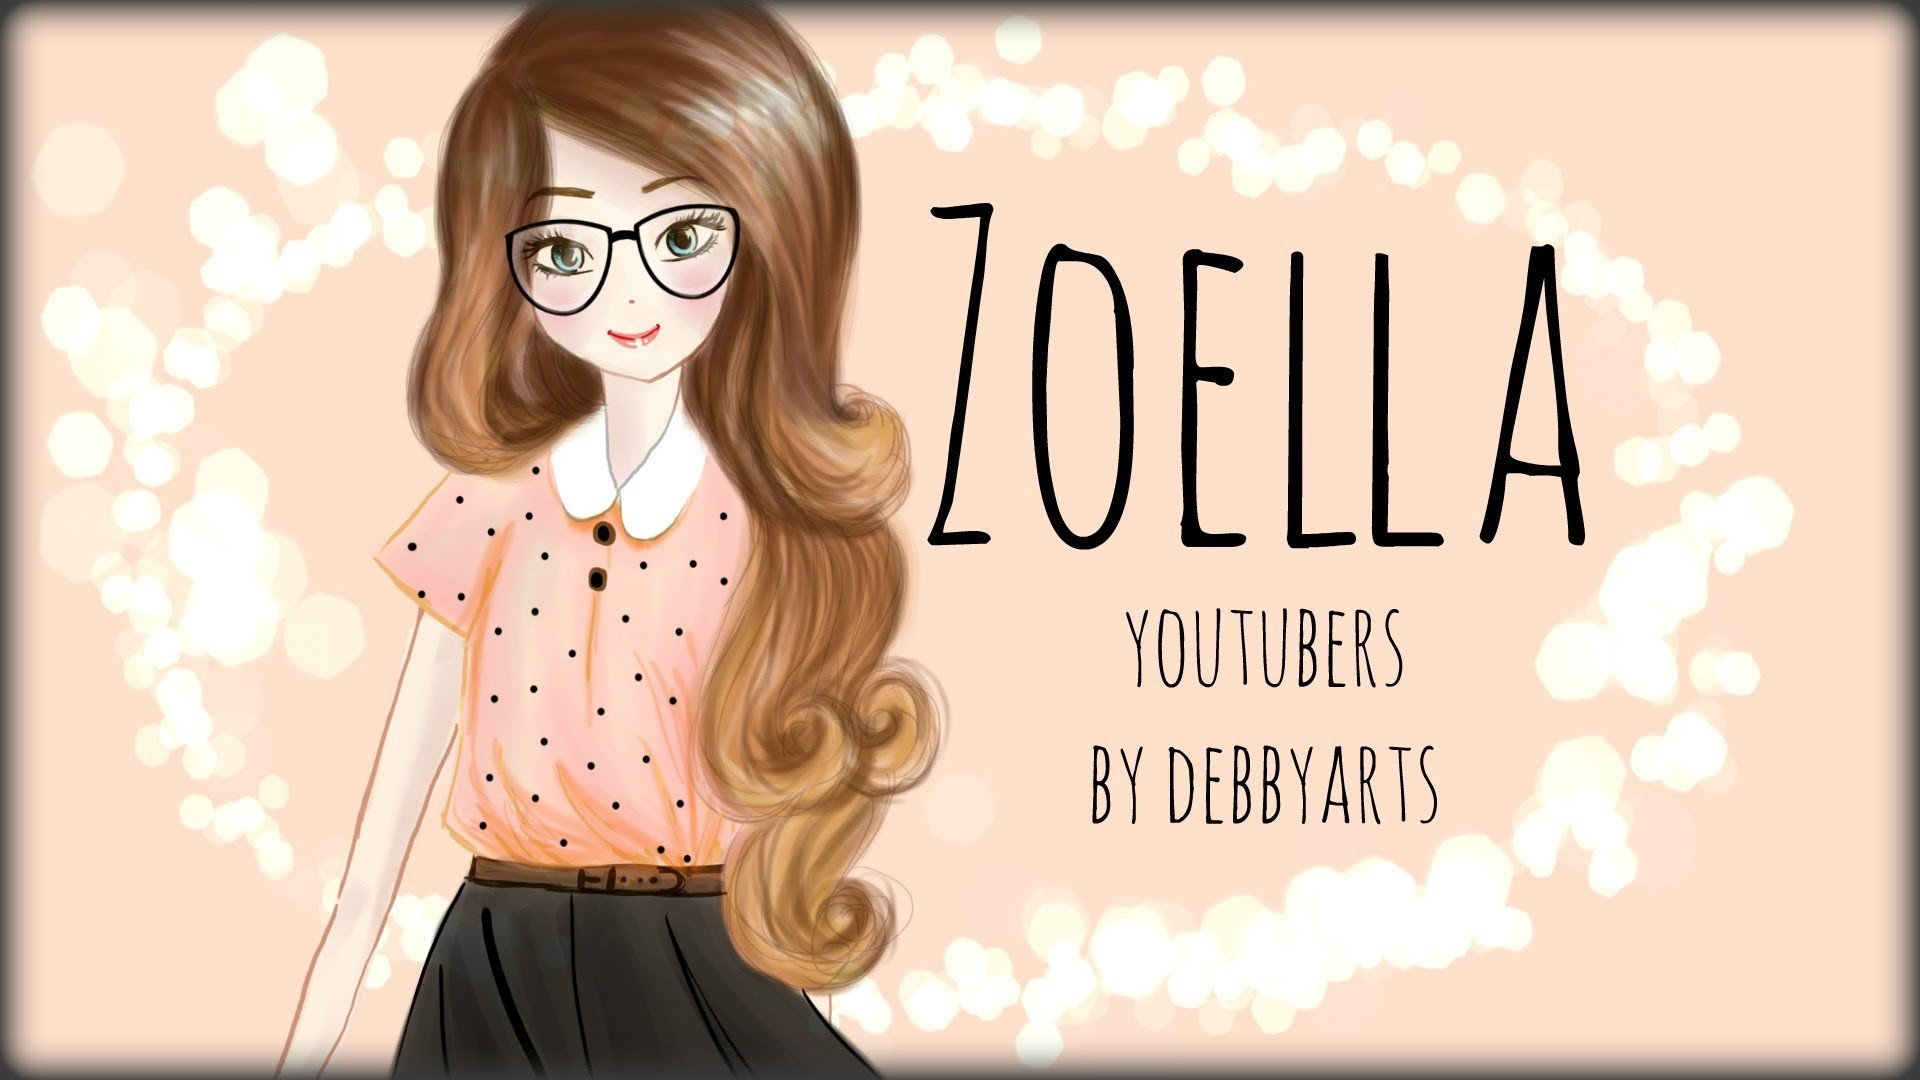 zoella drawing by debbyarts